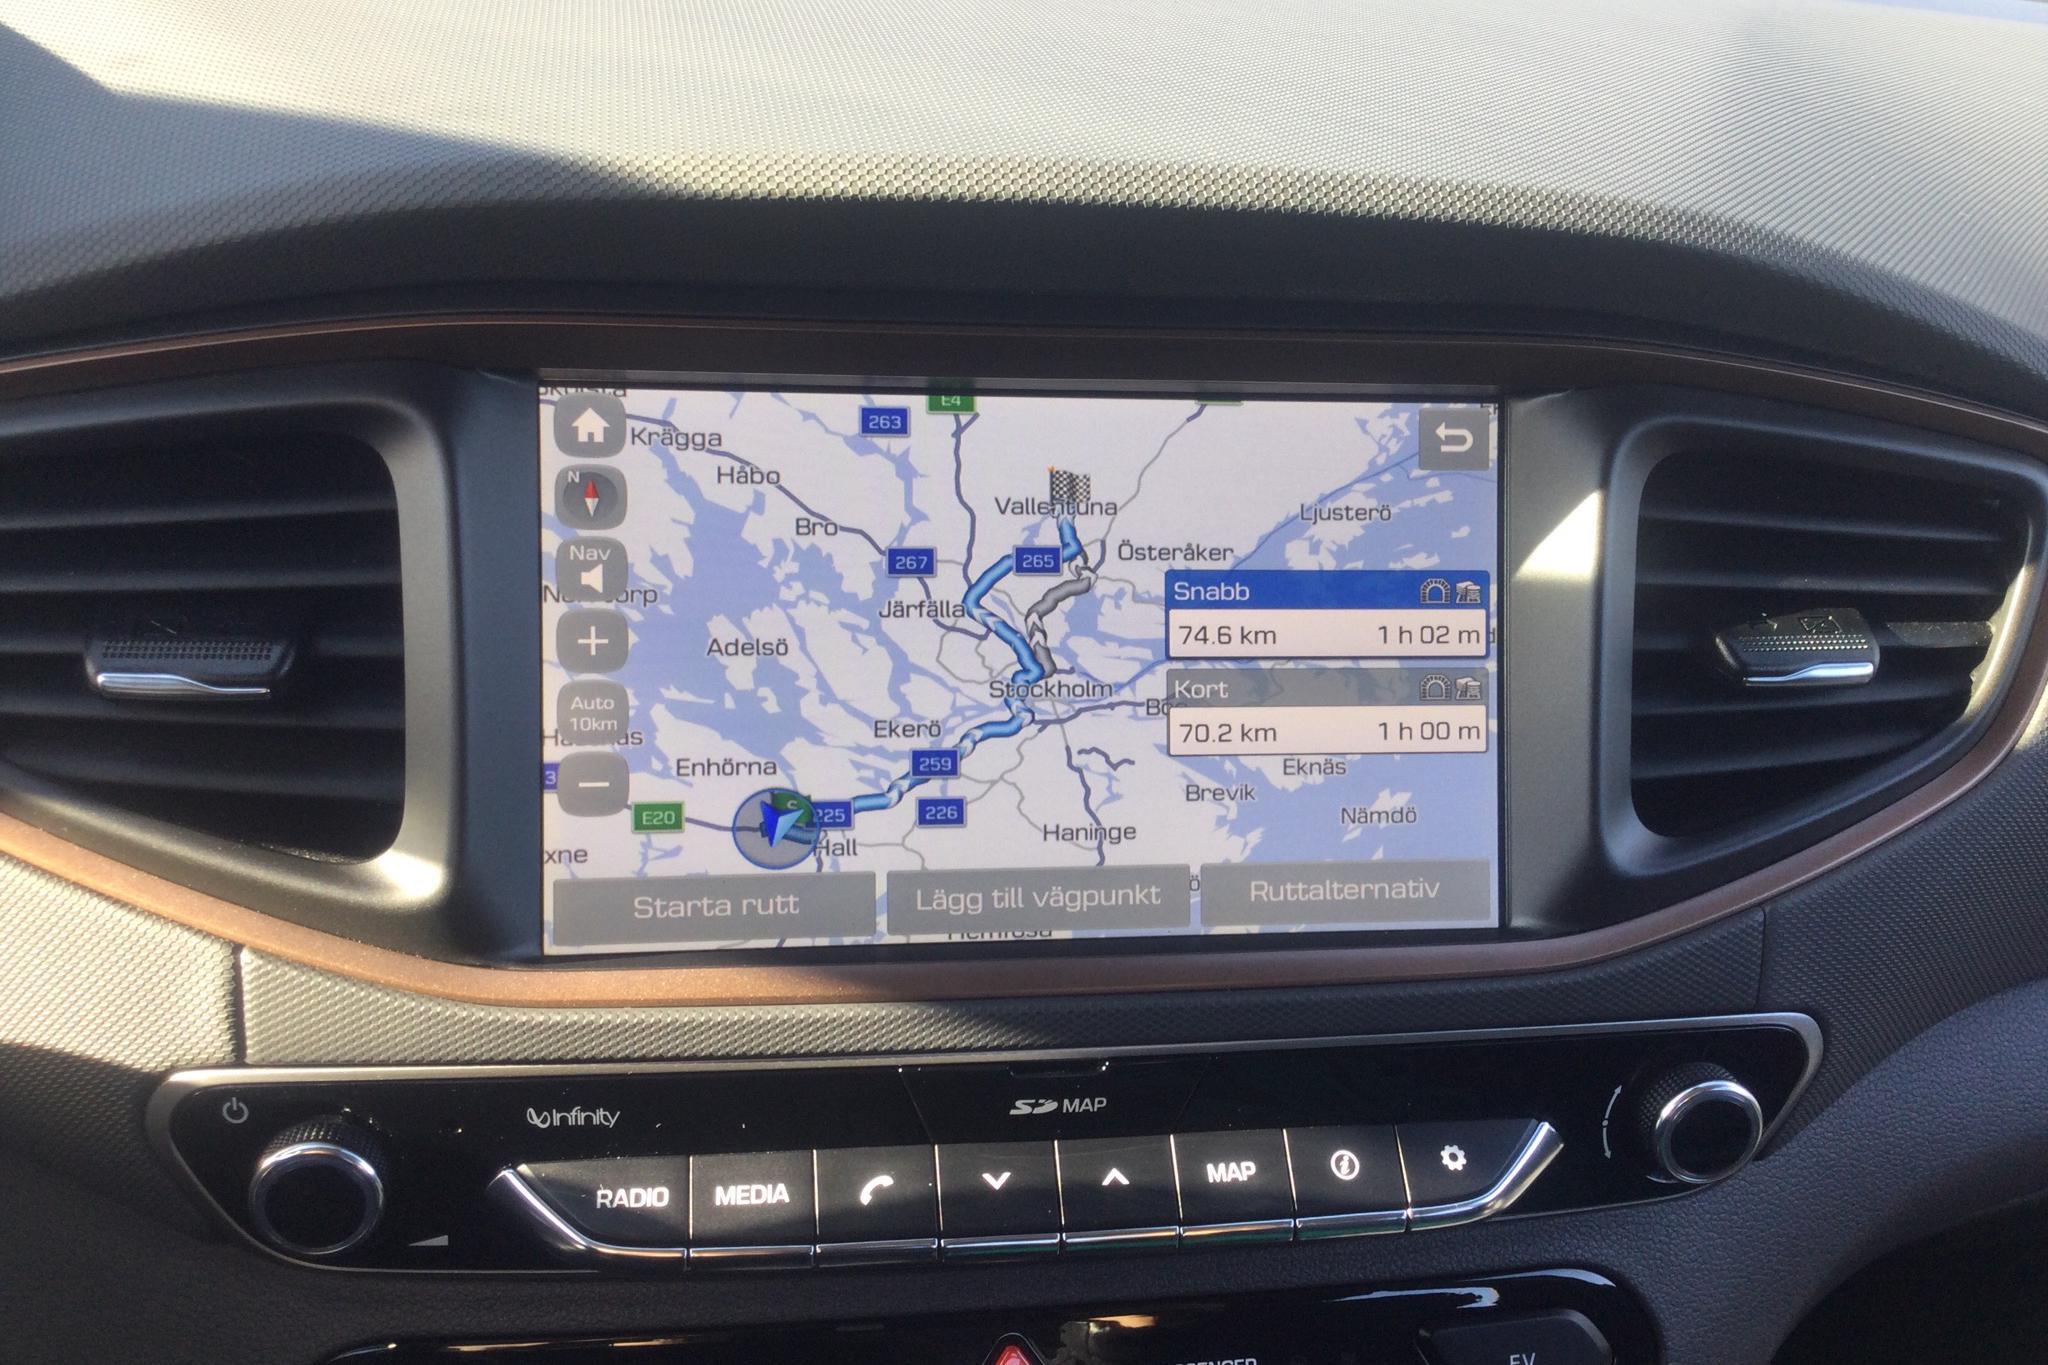 Hyundai IONIQ Electric (120hk) - 15 200 km - Automatic - 2019